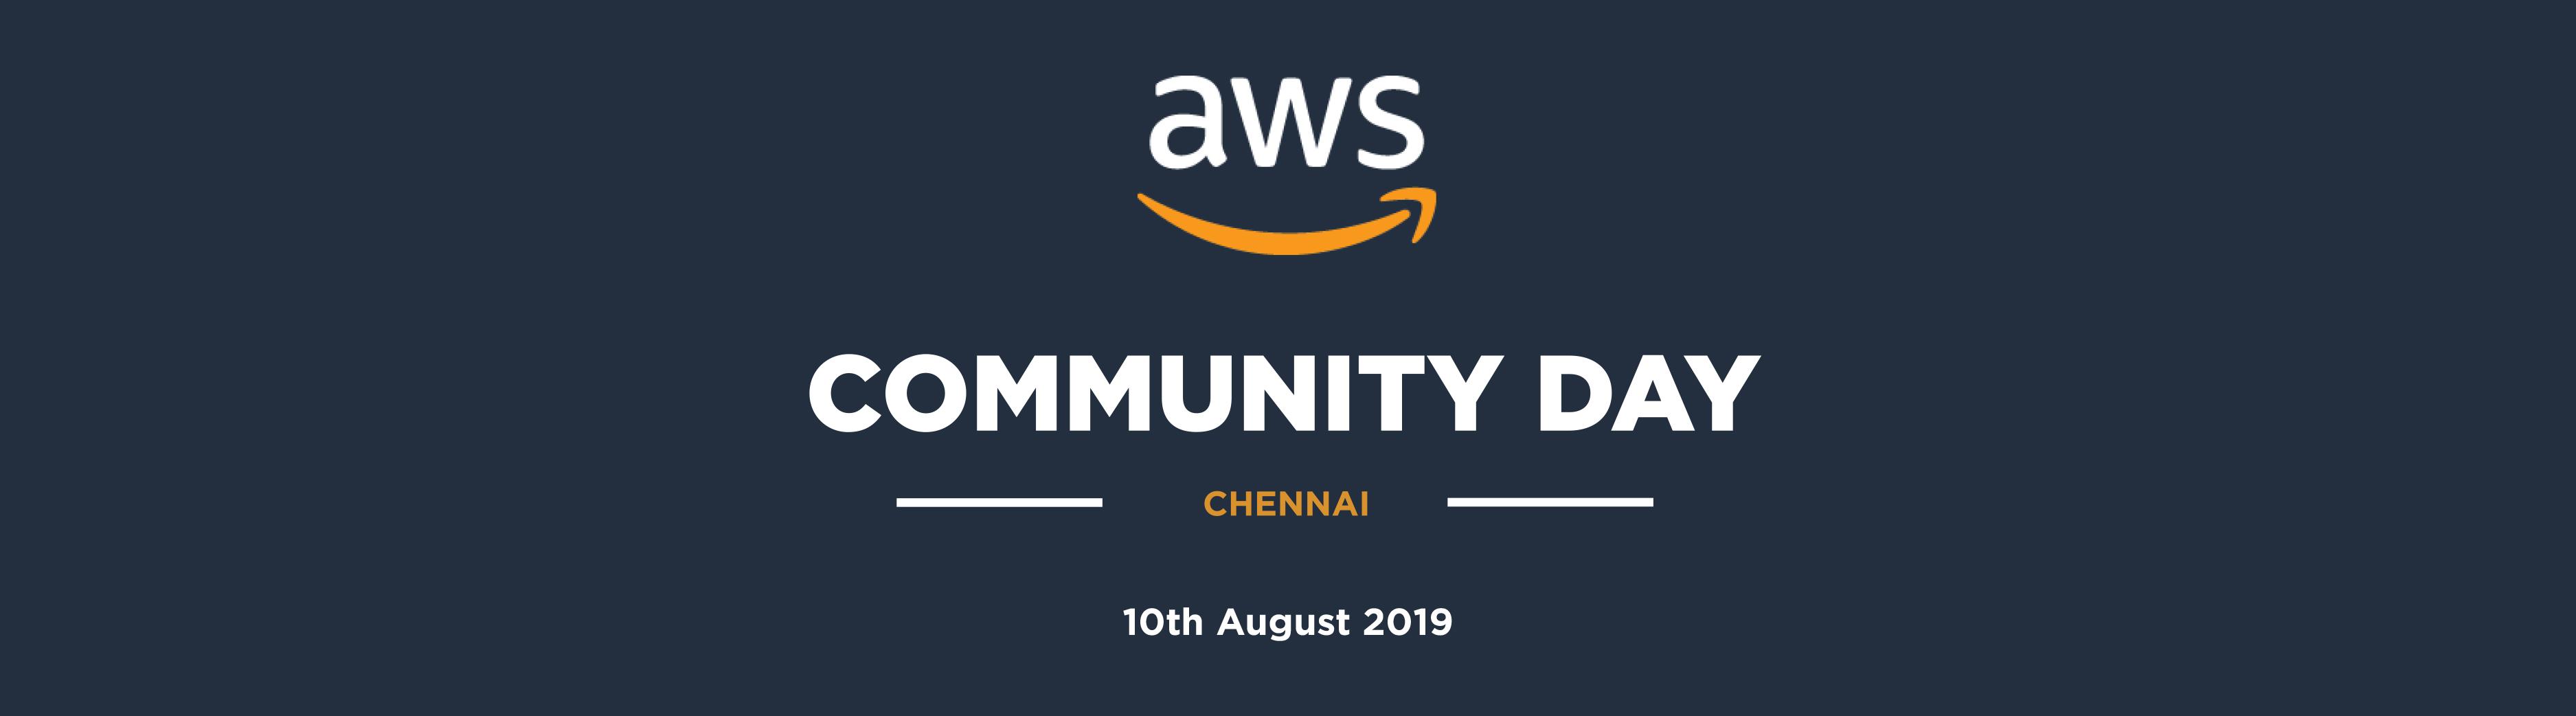 AWS Community Day - Chennai